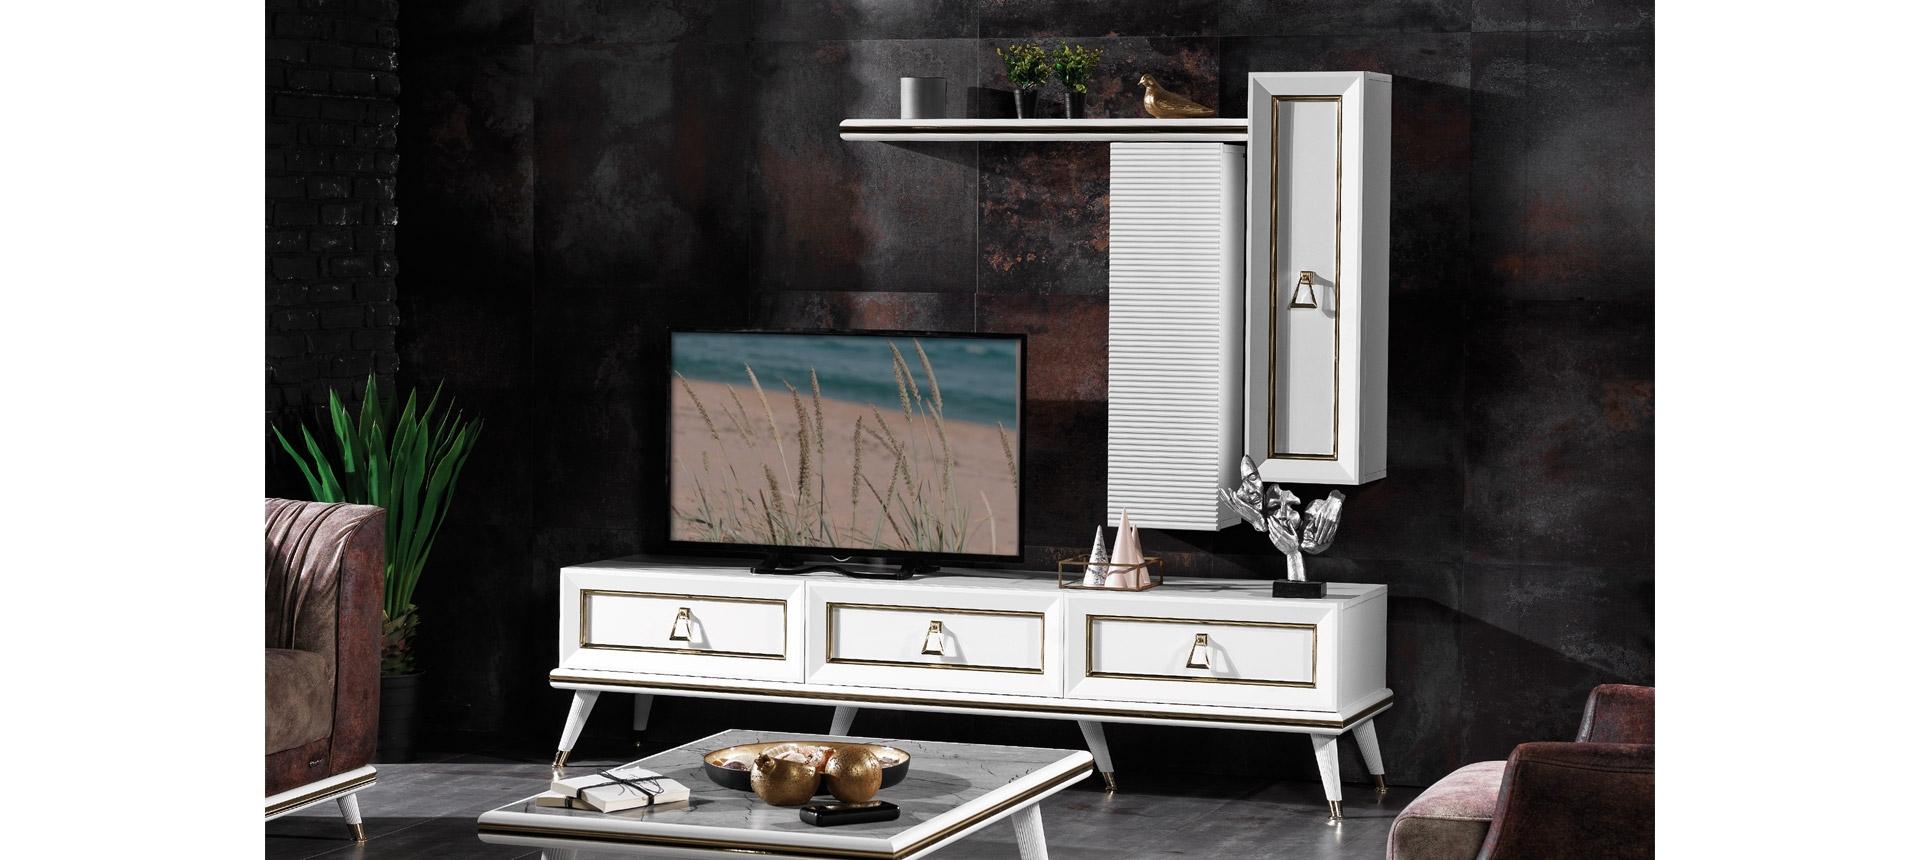 Comoda TV din pal si metal, cu 3 sertare Toscana Alb / Auriu, l203xA50xH50 cm